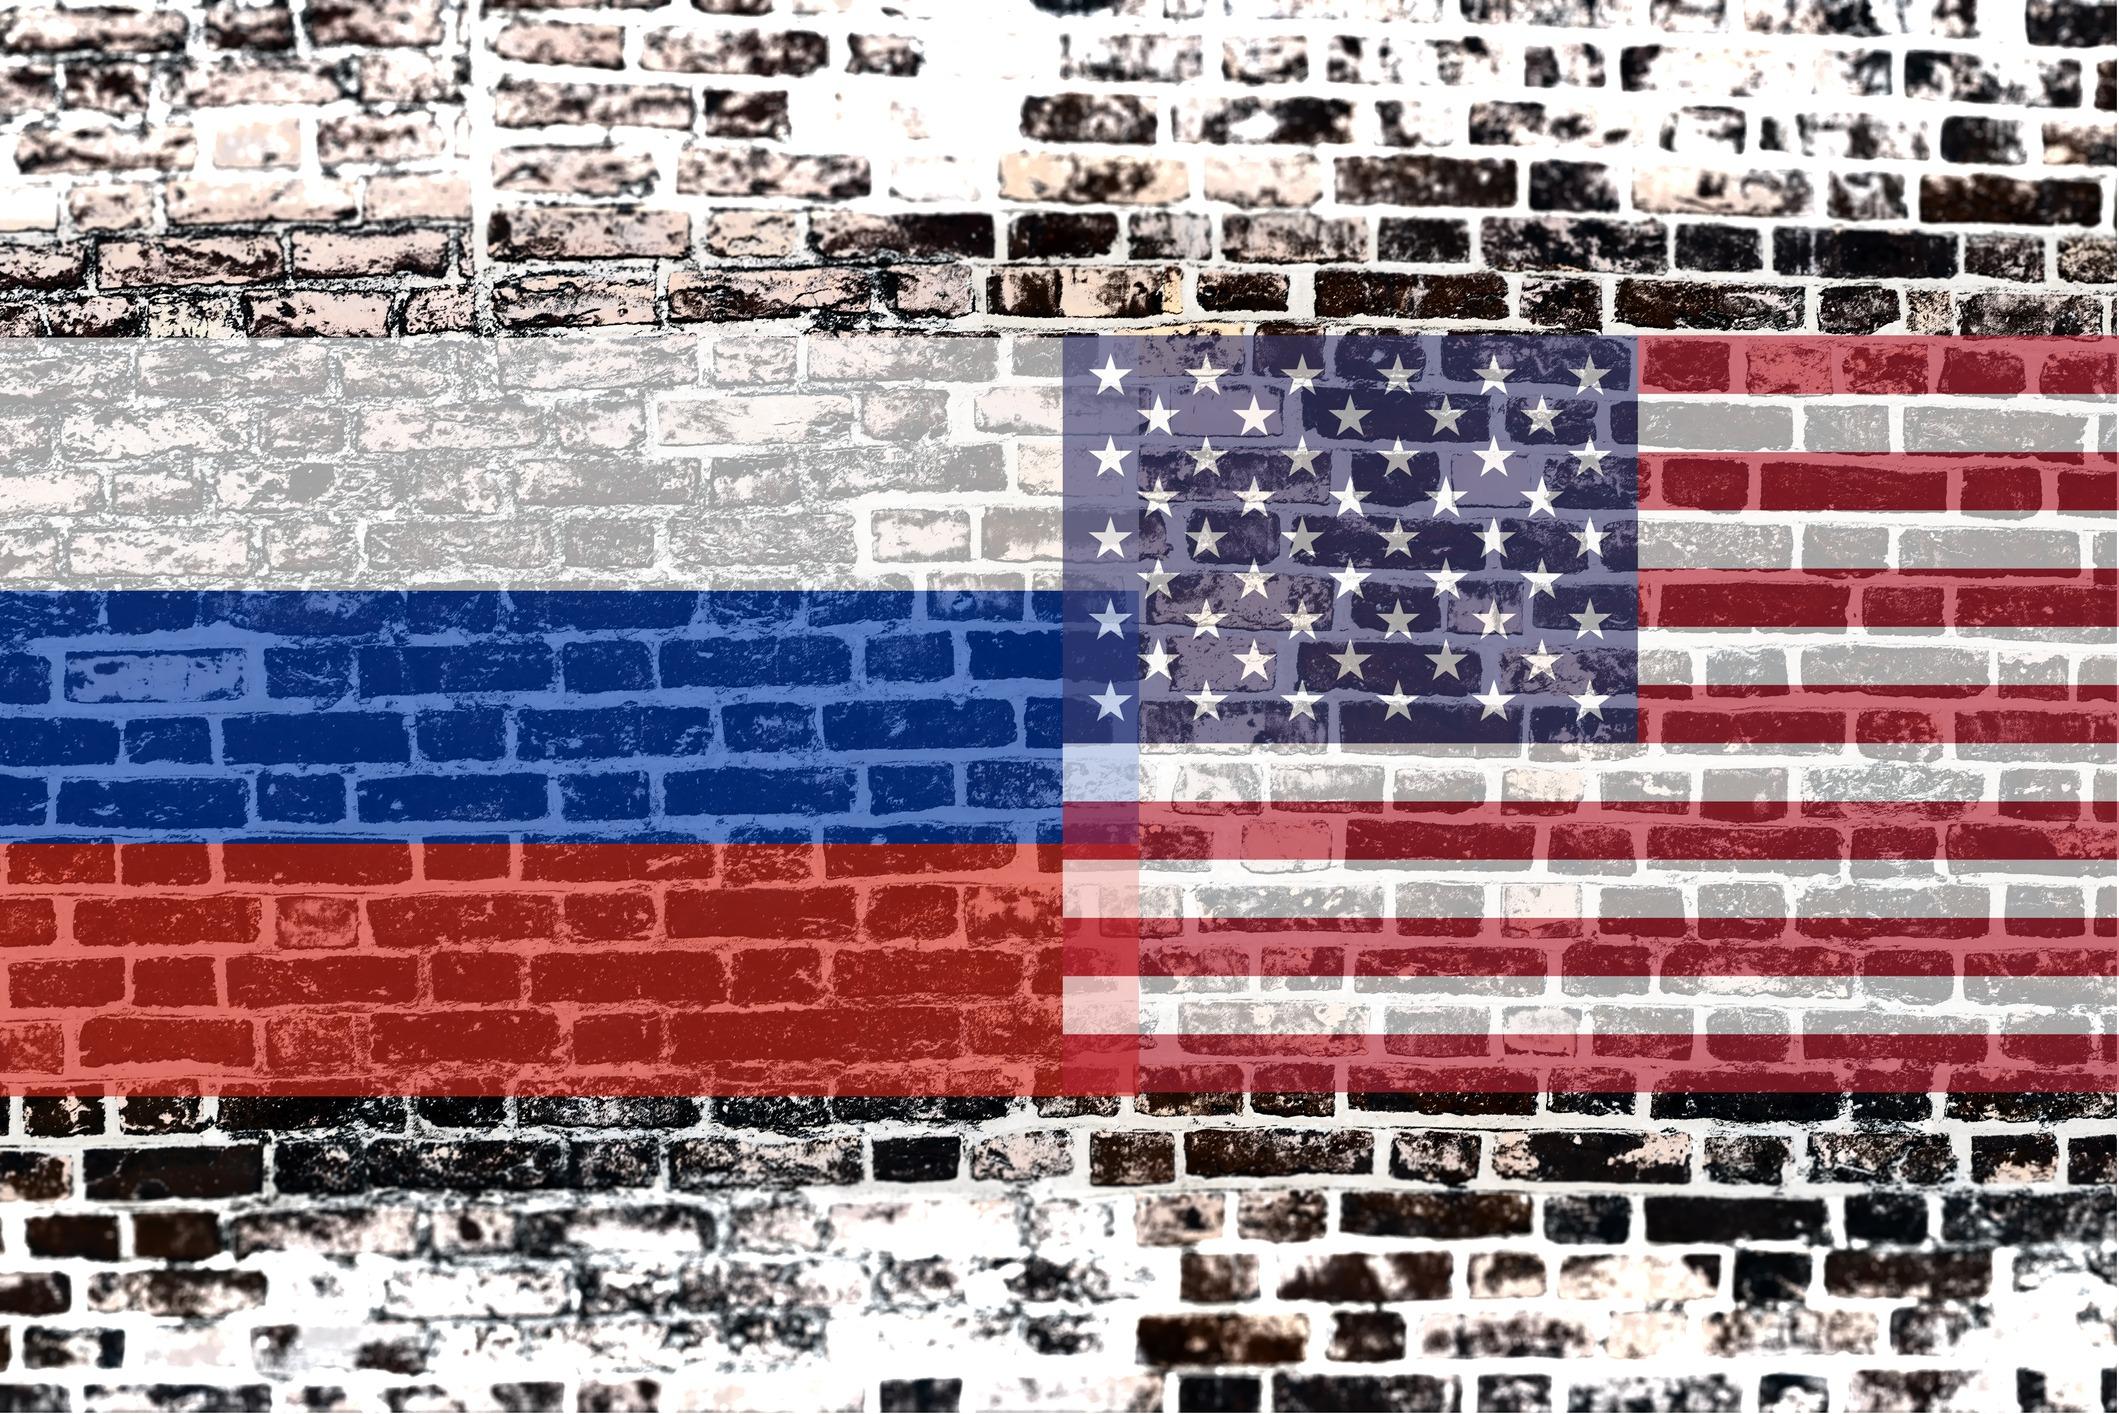 Putin-Biden Summit - a blend of realism and hope